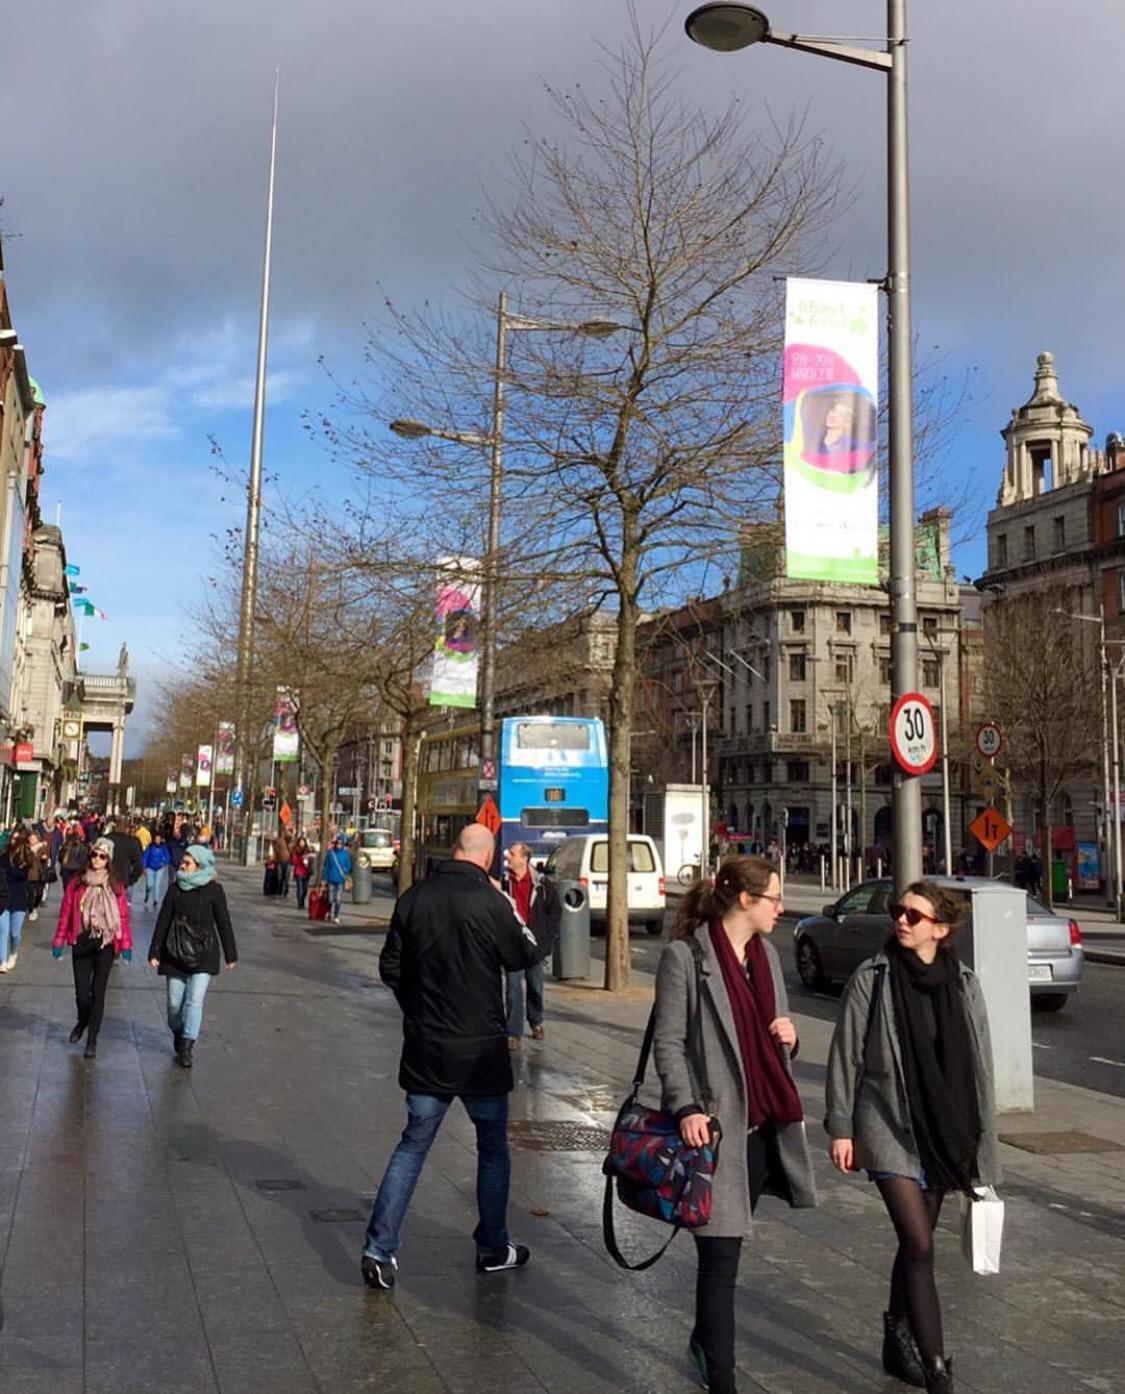 Dublin Streetlight Banners